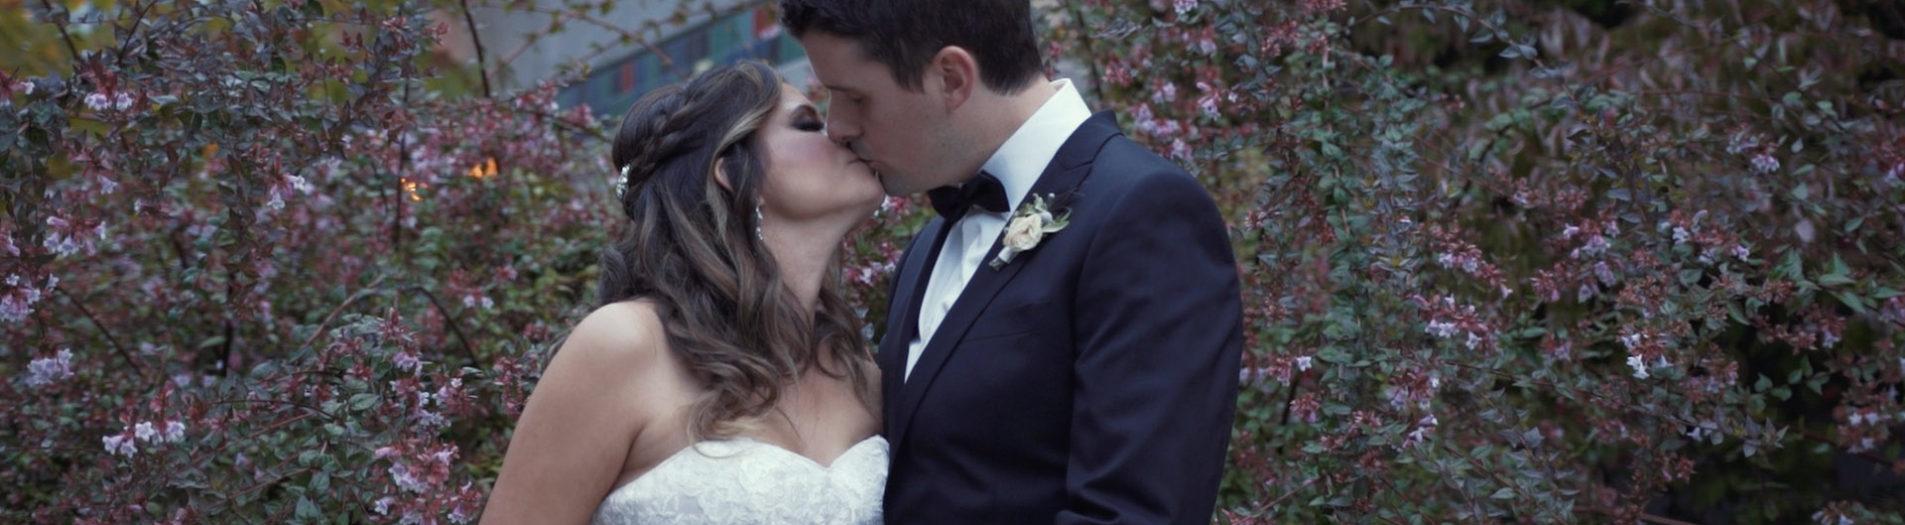 Jacquie + Mark | Wedding Highlight Film | Robert Lee Hall, Vancouver BC